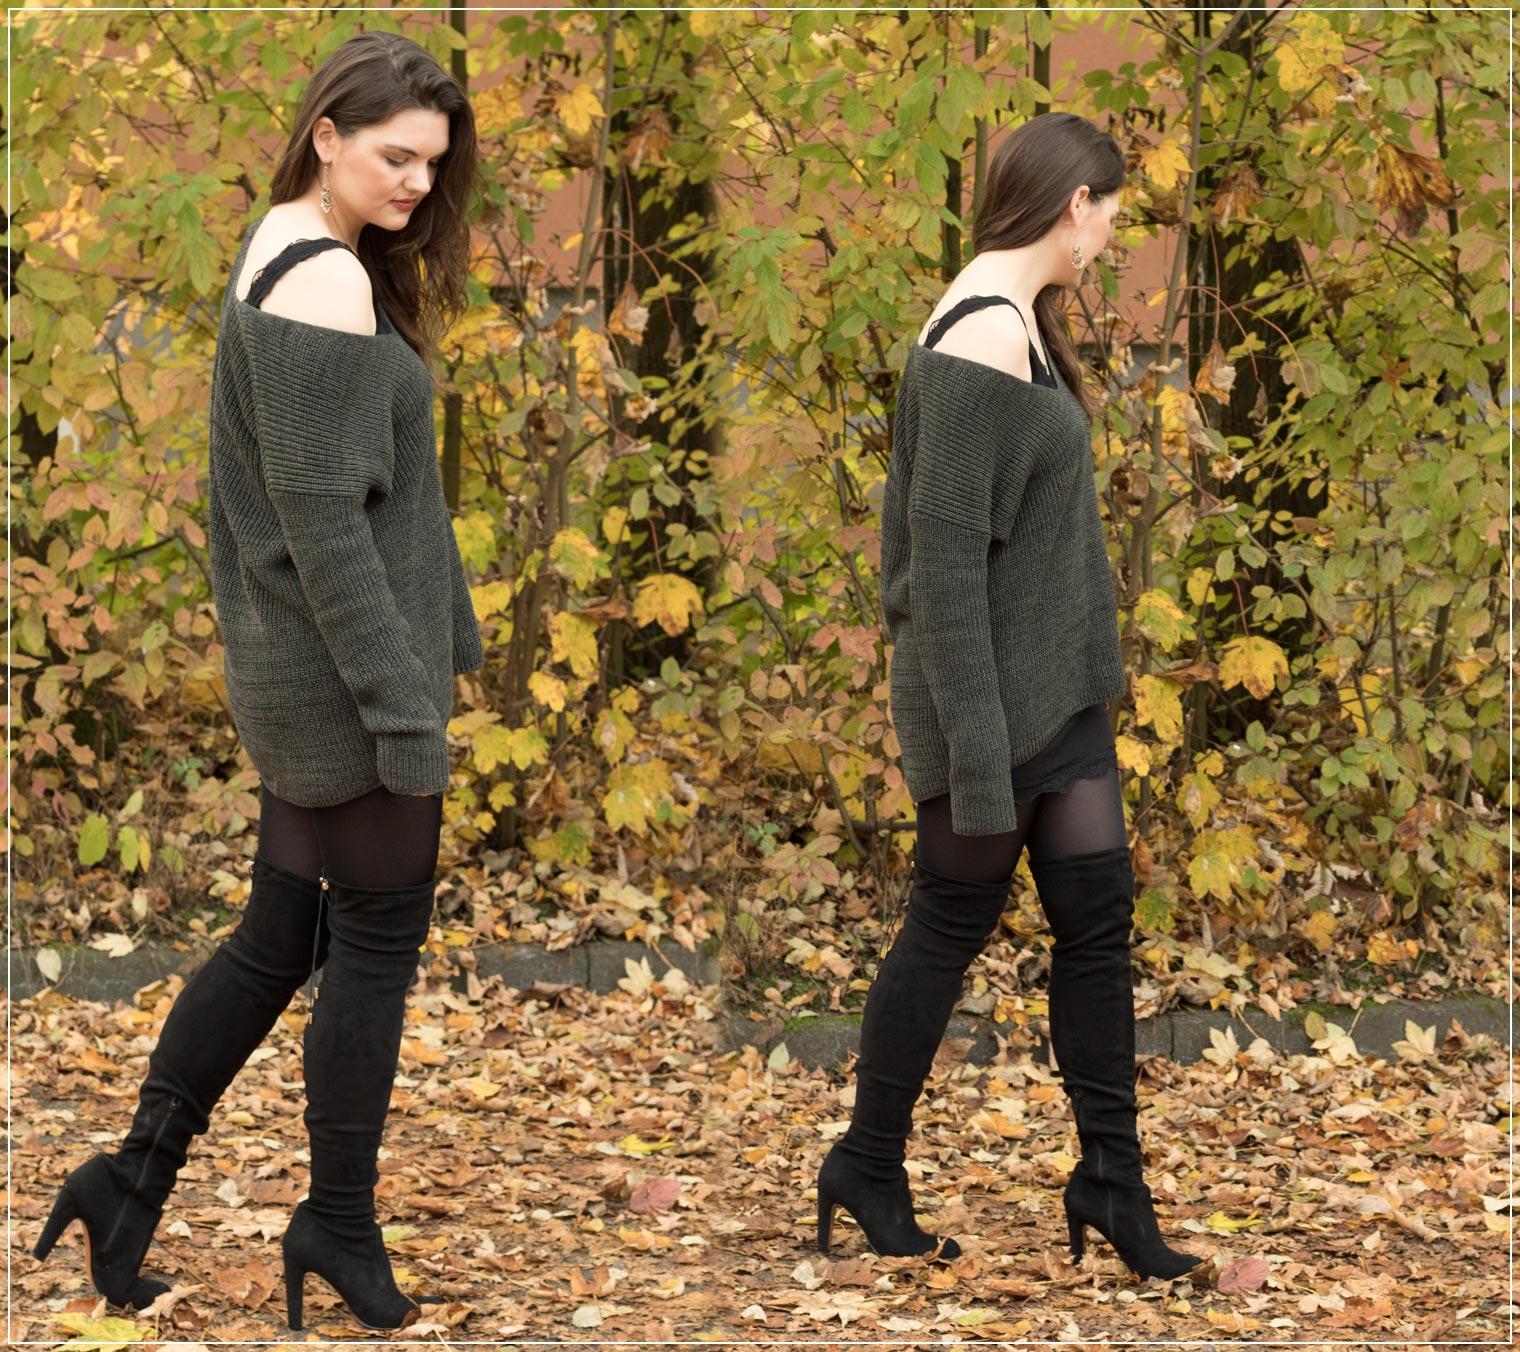 Herbstlook mit Overknees und Layering